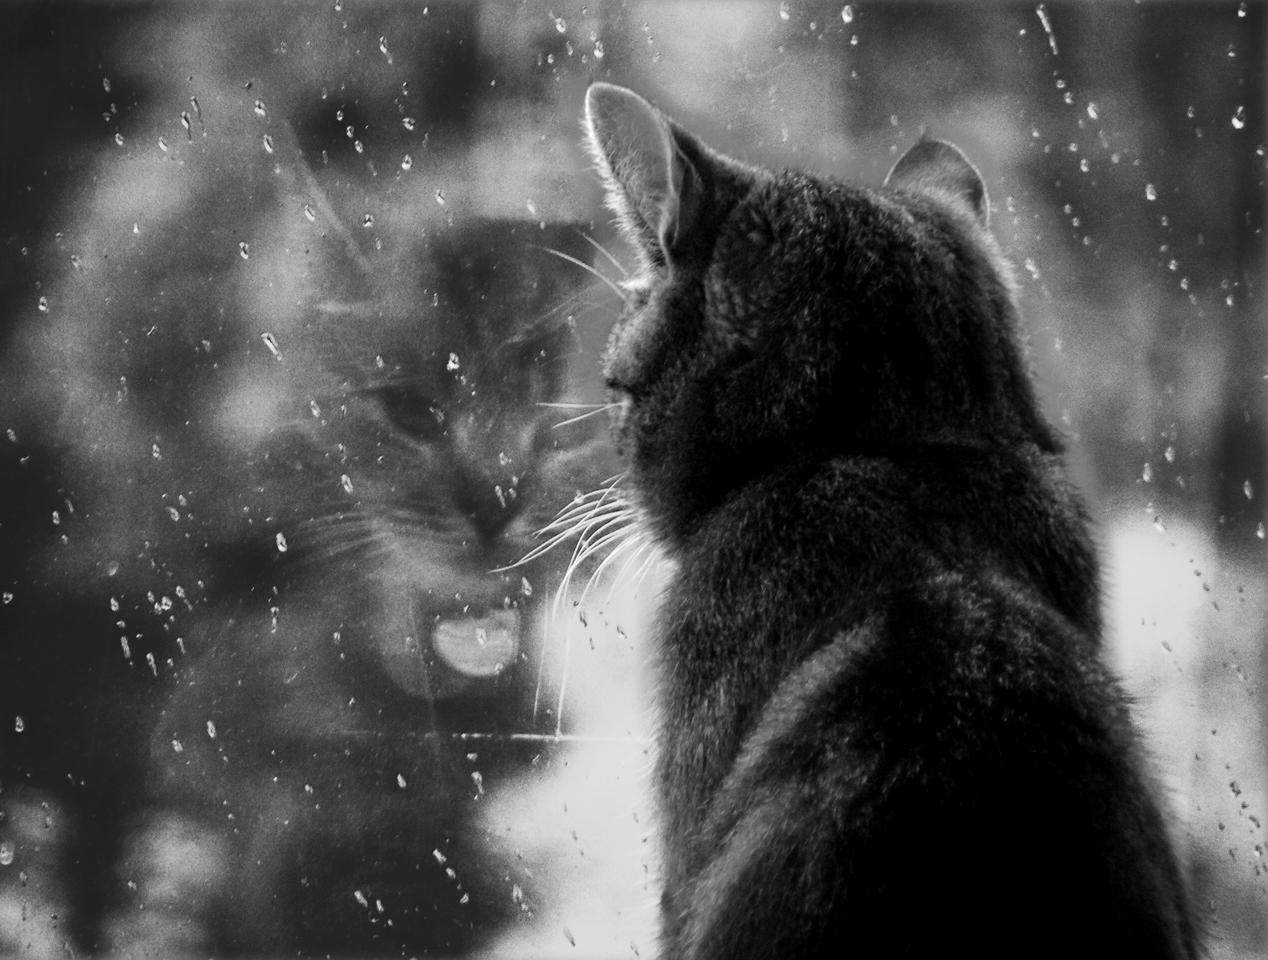 http://fc95.deviantart.com/fs21/f/2007/266/2/2/rain__rain__go_away_by_PrettyMoment.jpg